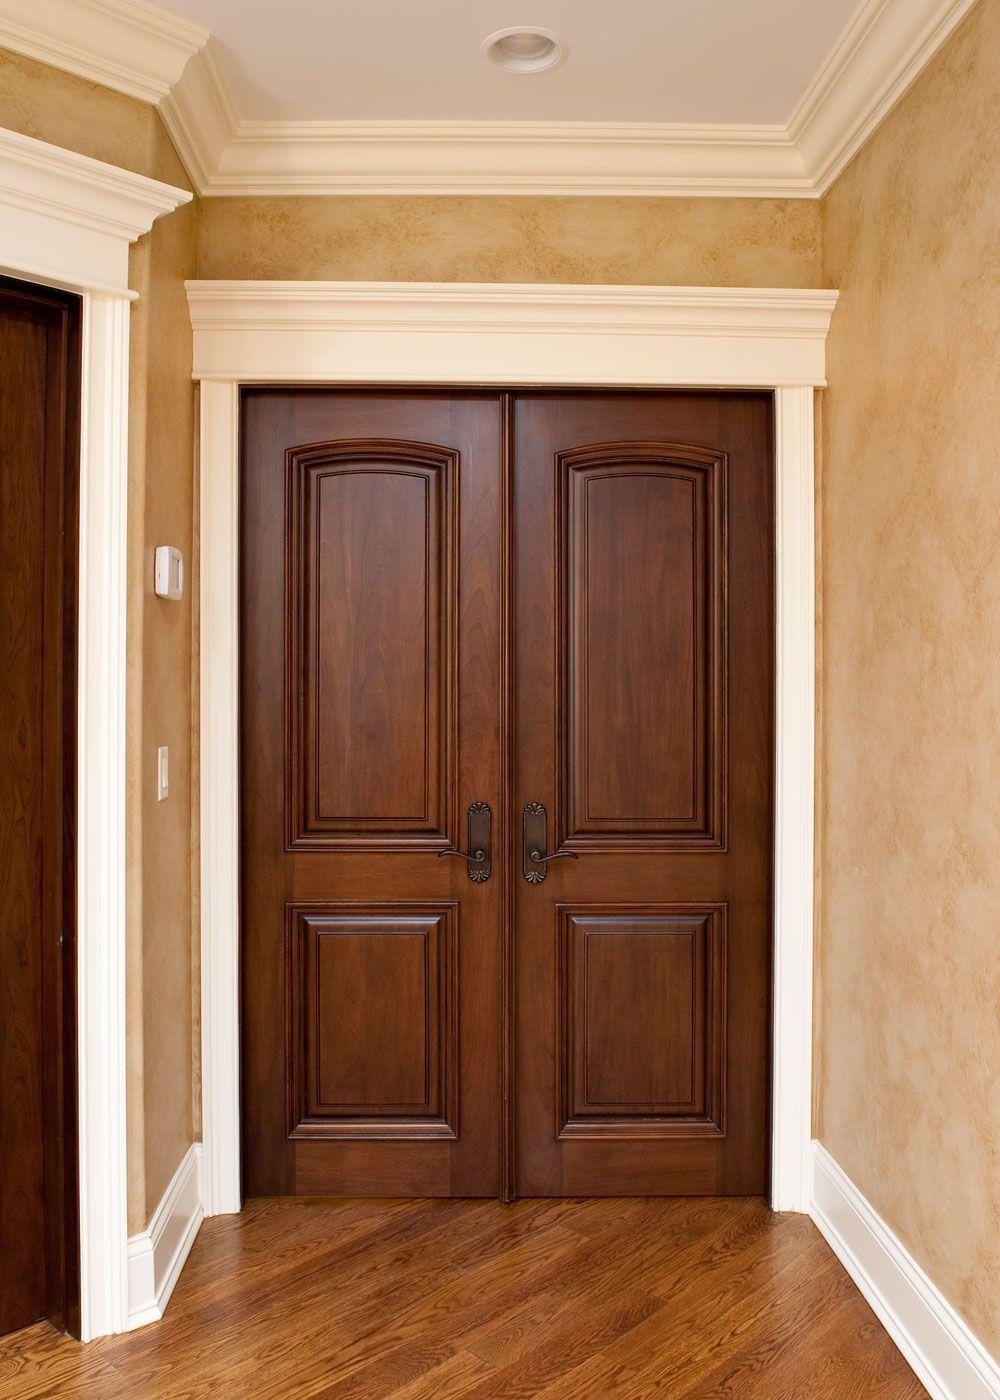 Interior Door Custom Double Solid Wood With Walnut Finish Classic Model Dbi 701 Dd Custom Interior Doors Solid Wood Interior Door Wooden Doors Interior